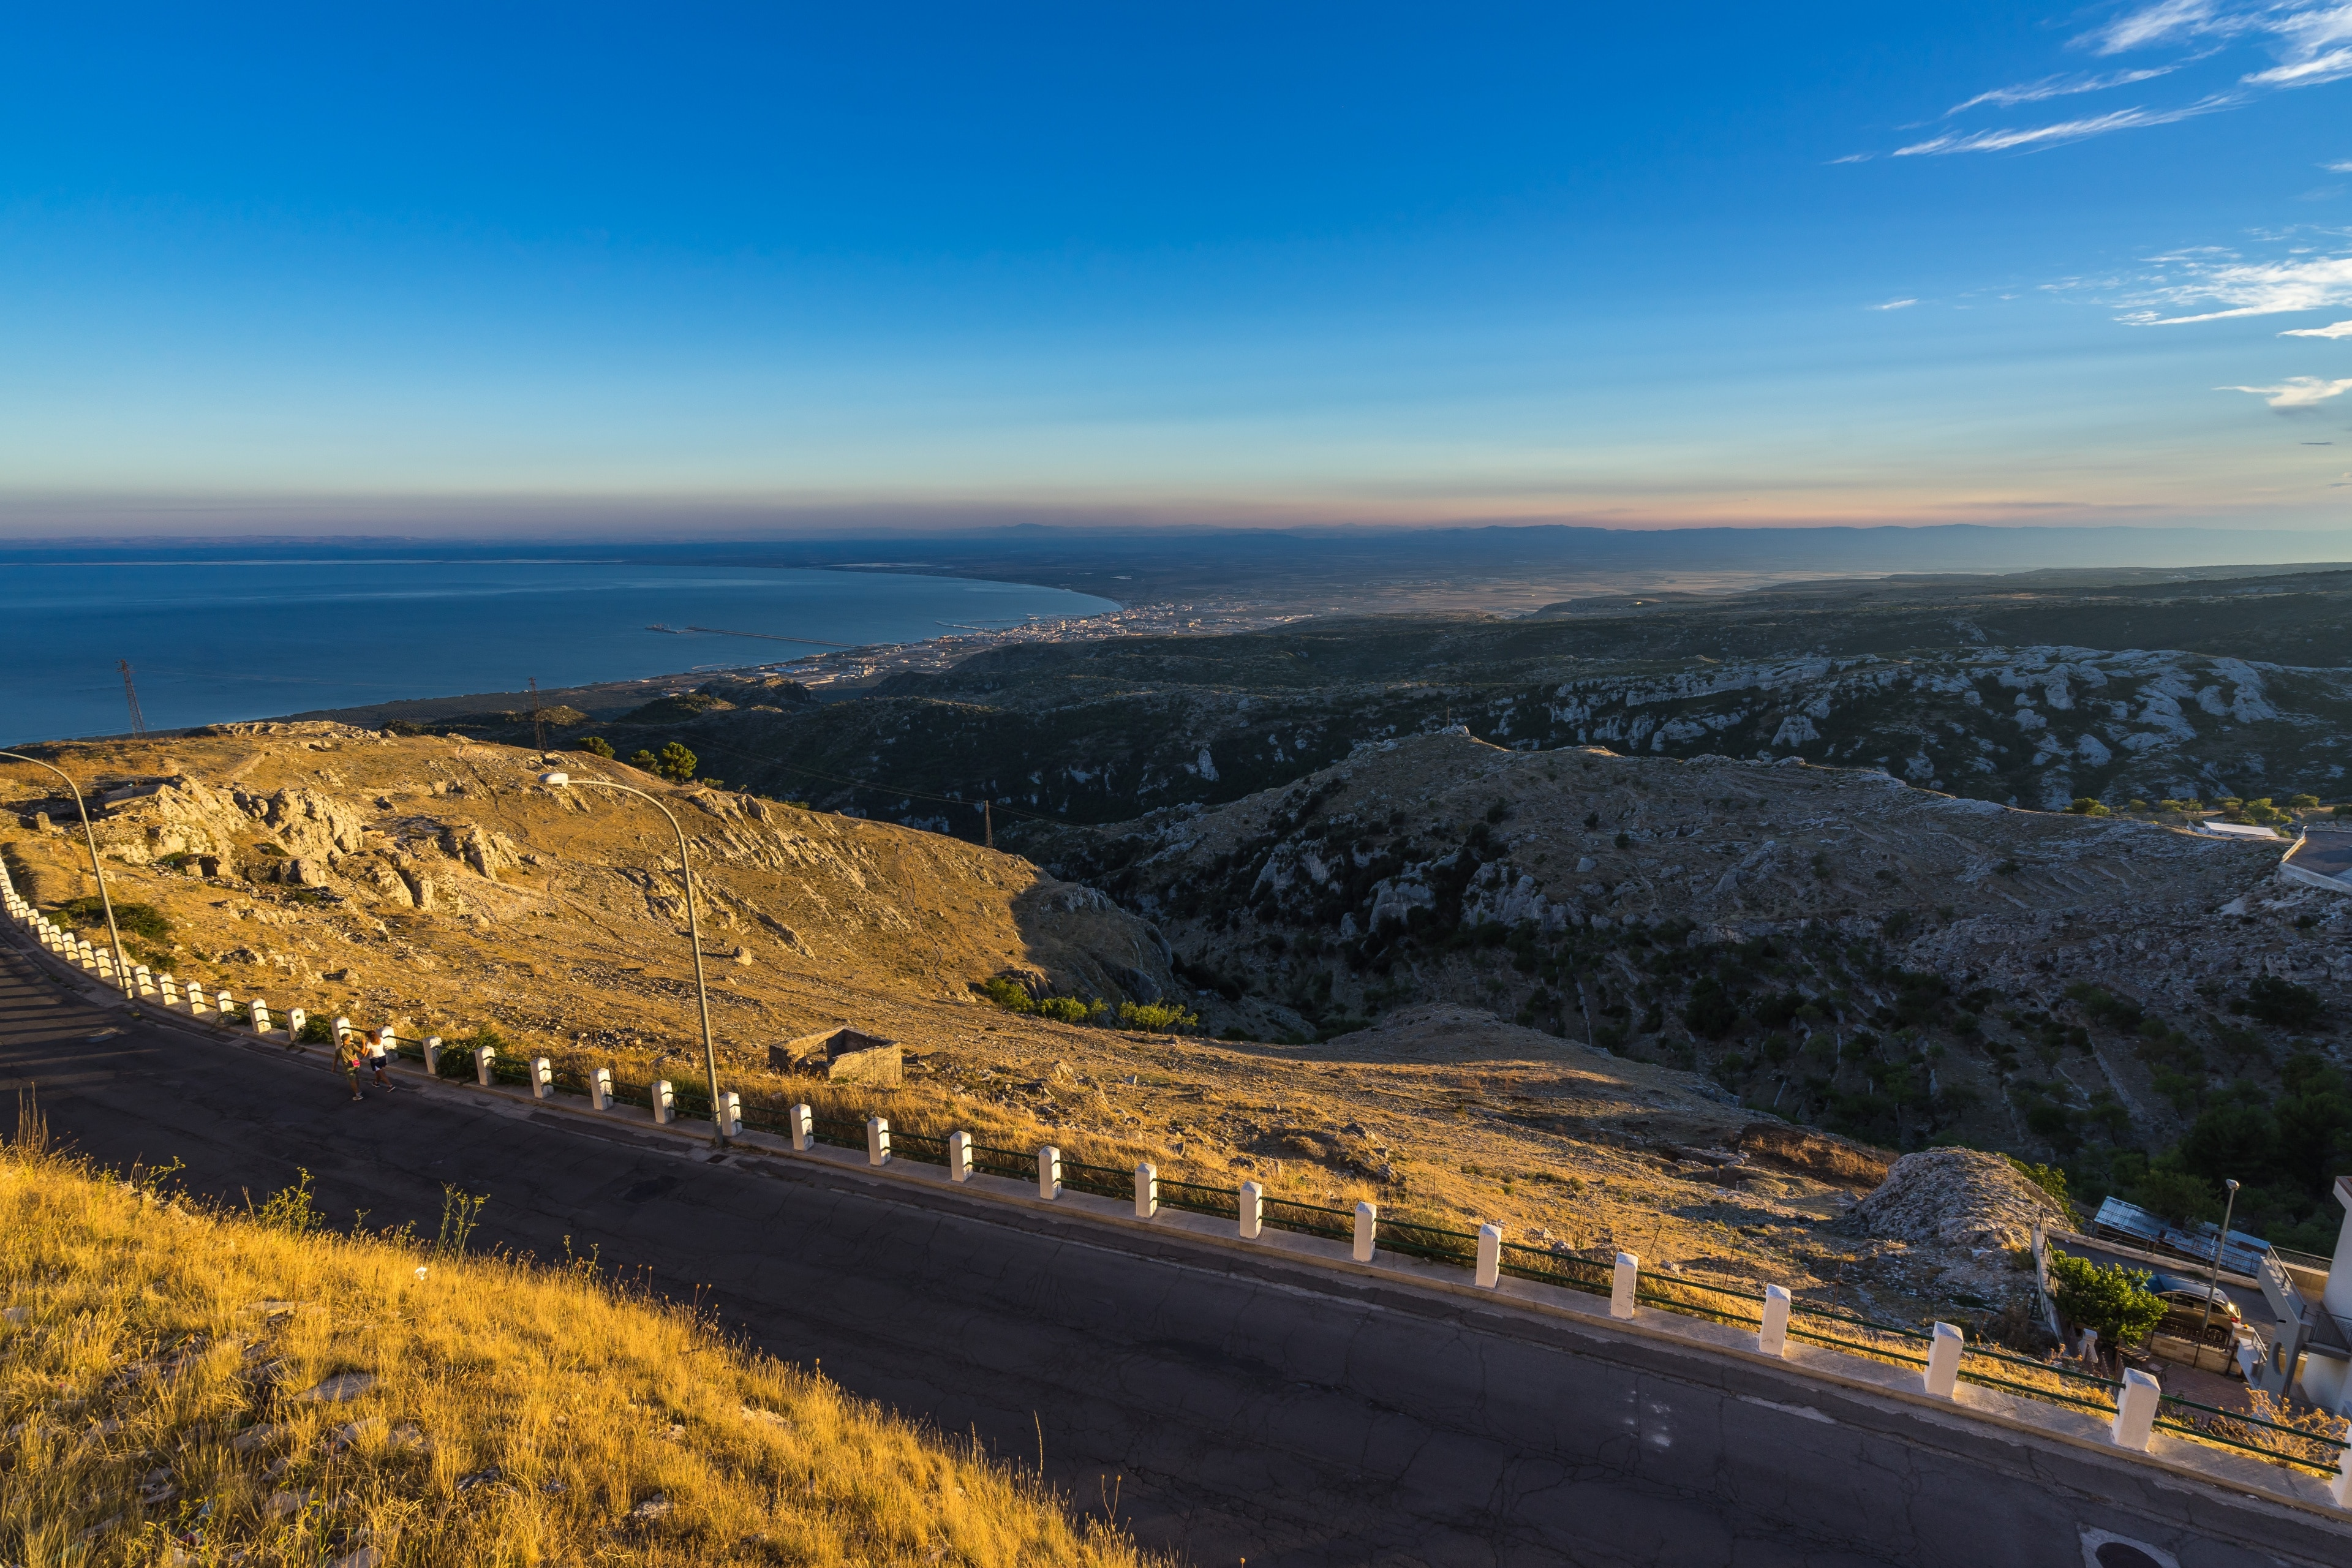 Manfredonia, Puglia, Italy